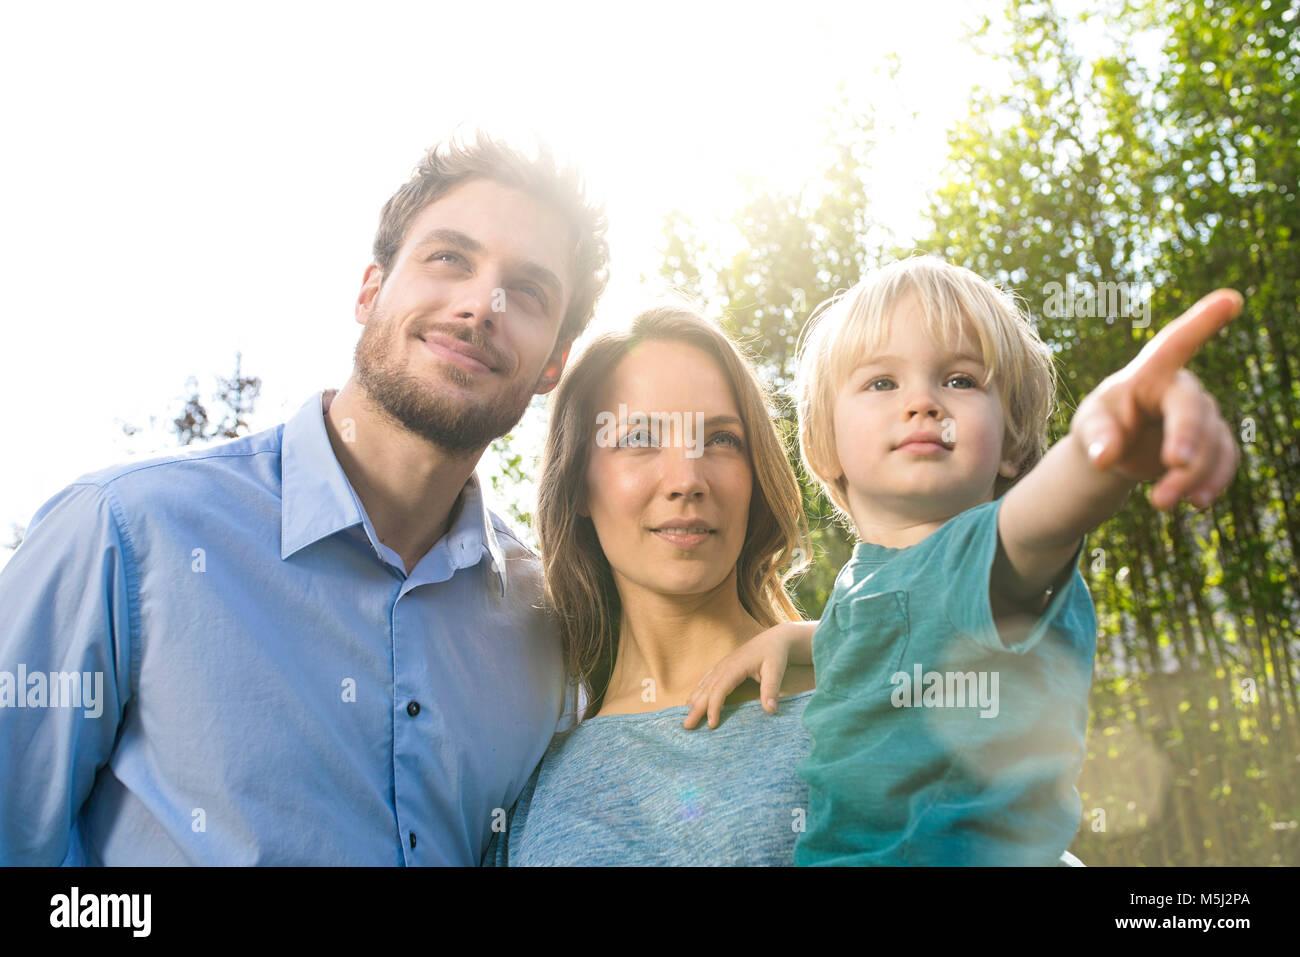 Smiling family en face de plantes de bambou avec fils pointant son doigt Photo Stock